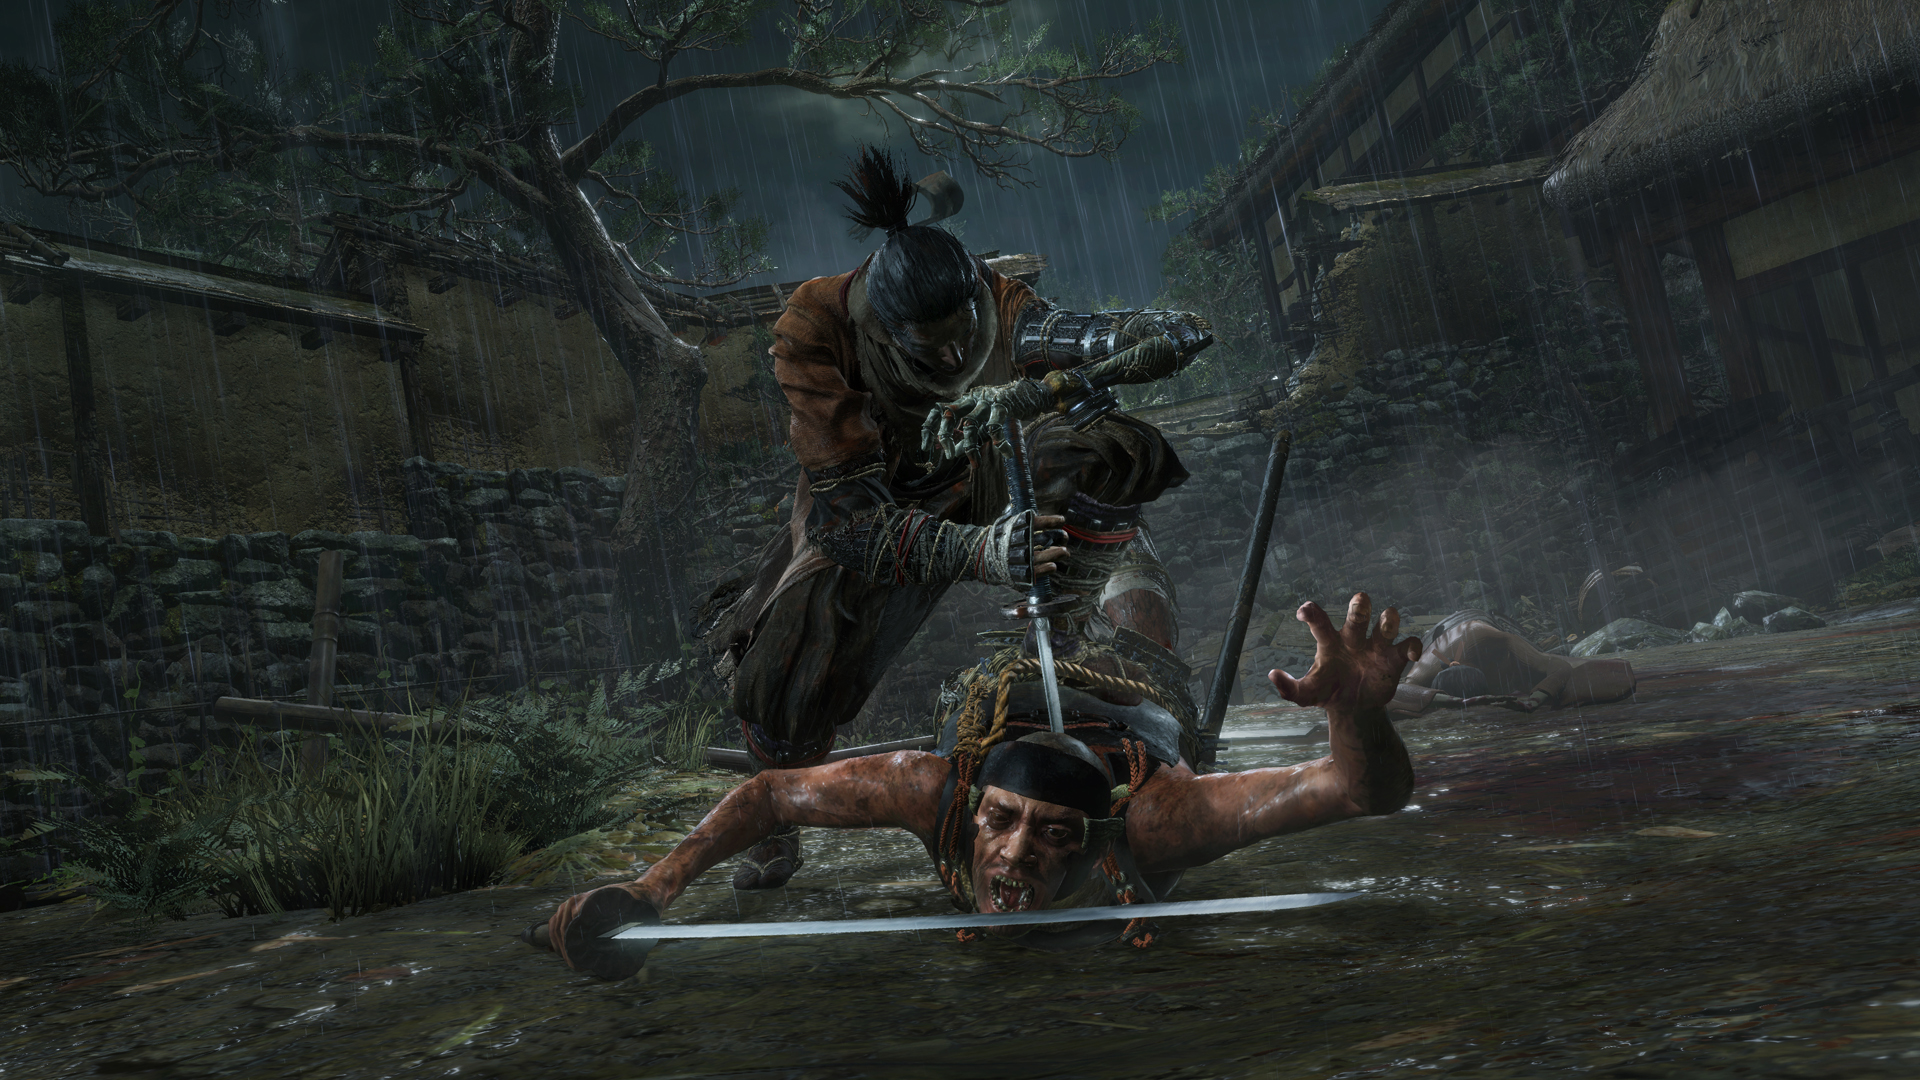 sekiro shadows die twice video game wallpaper 67294